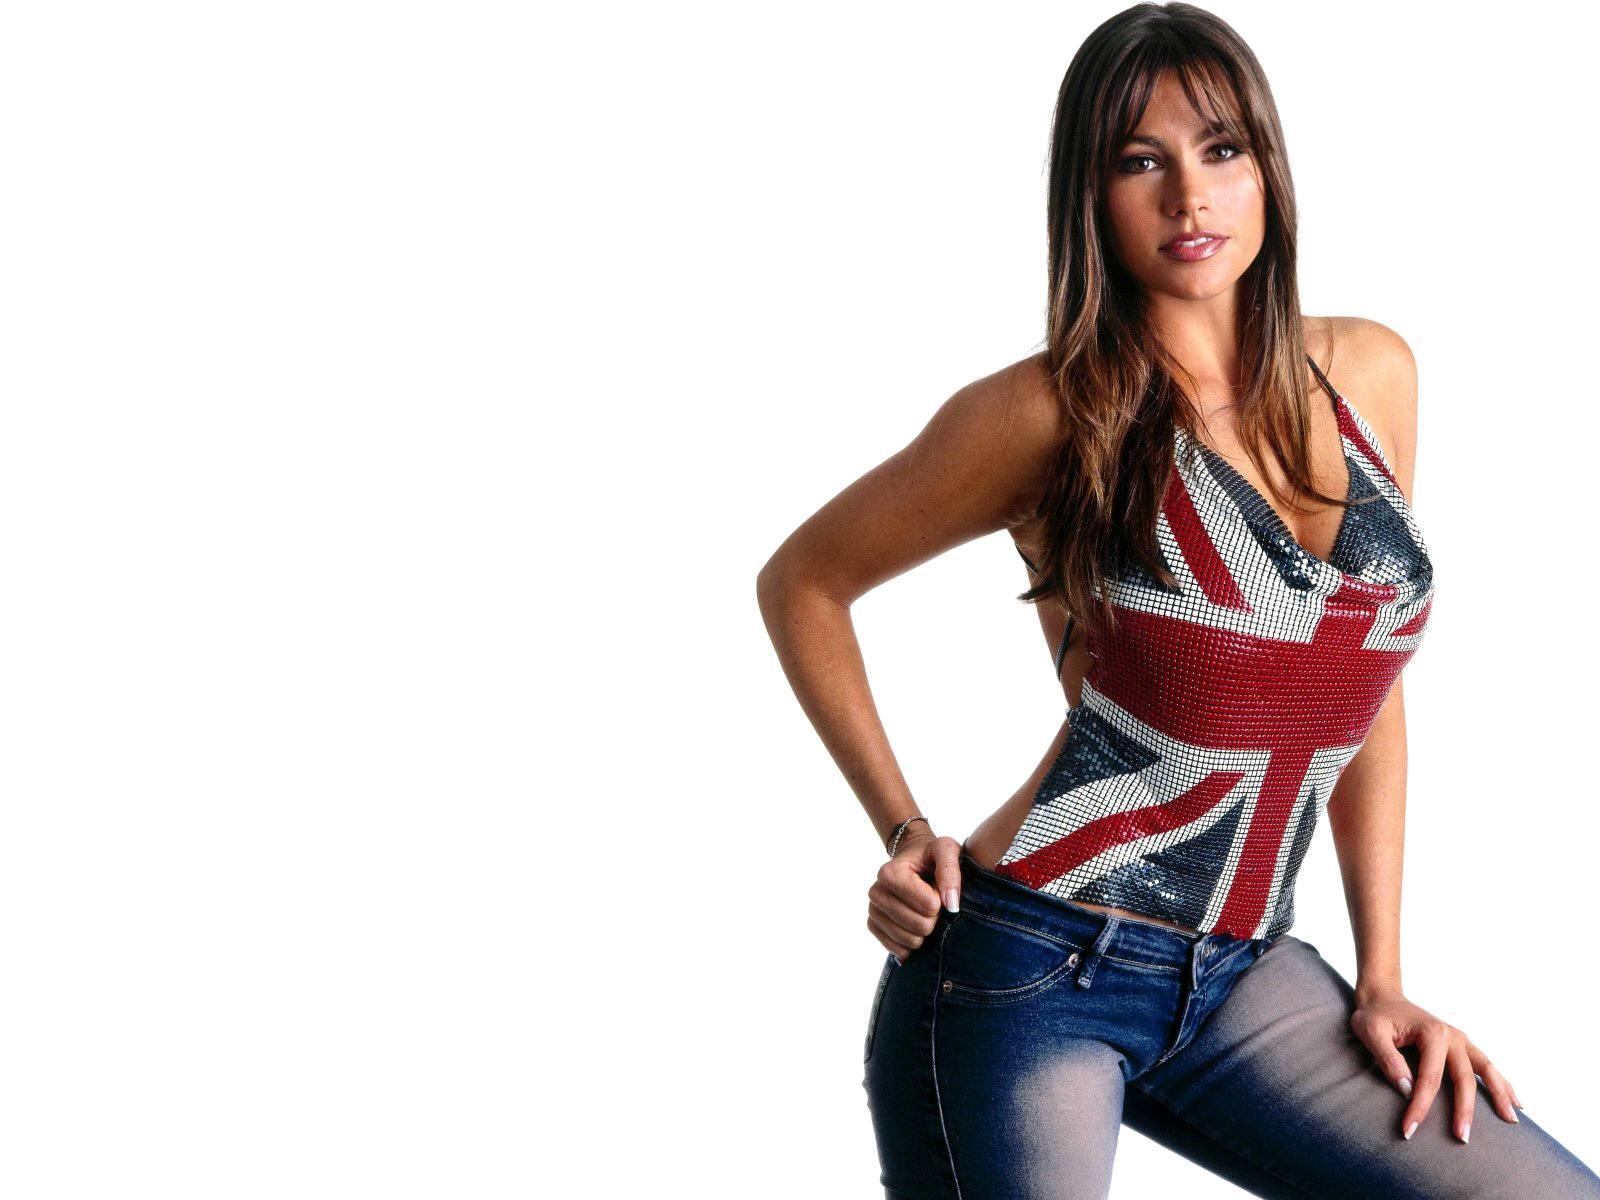 Sofia Vergara England Flag Top HD Wallpapers 1600x1200